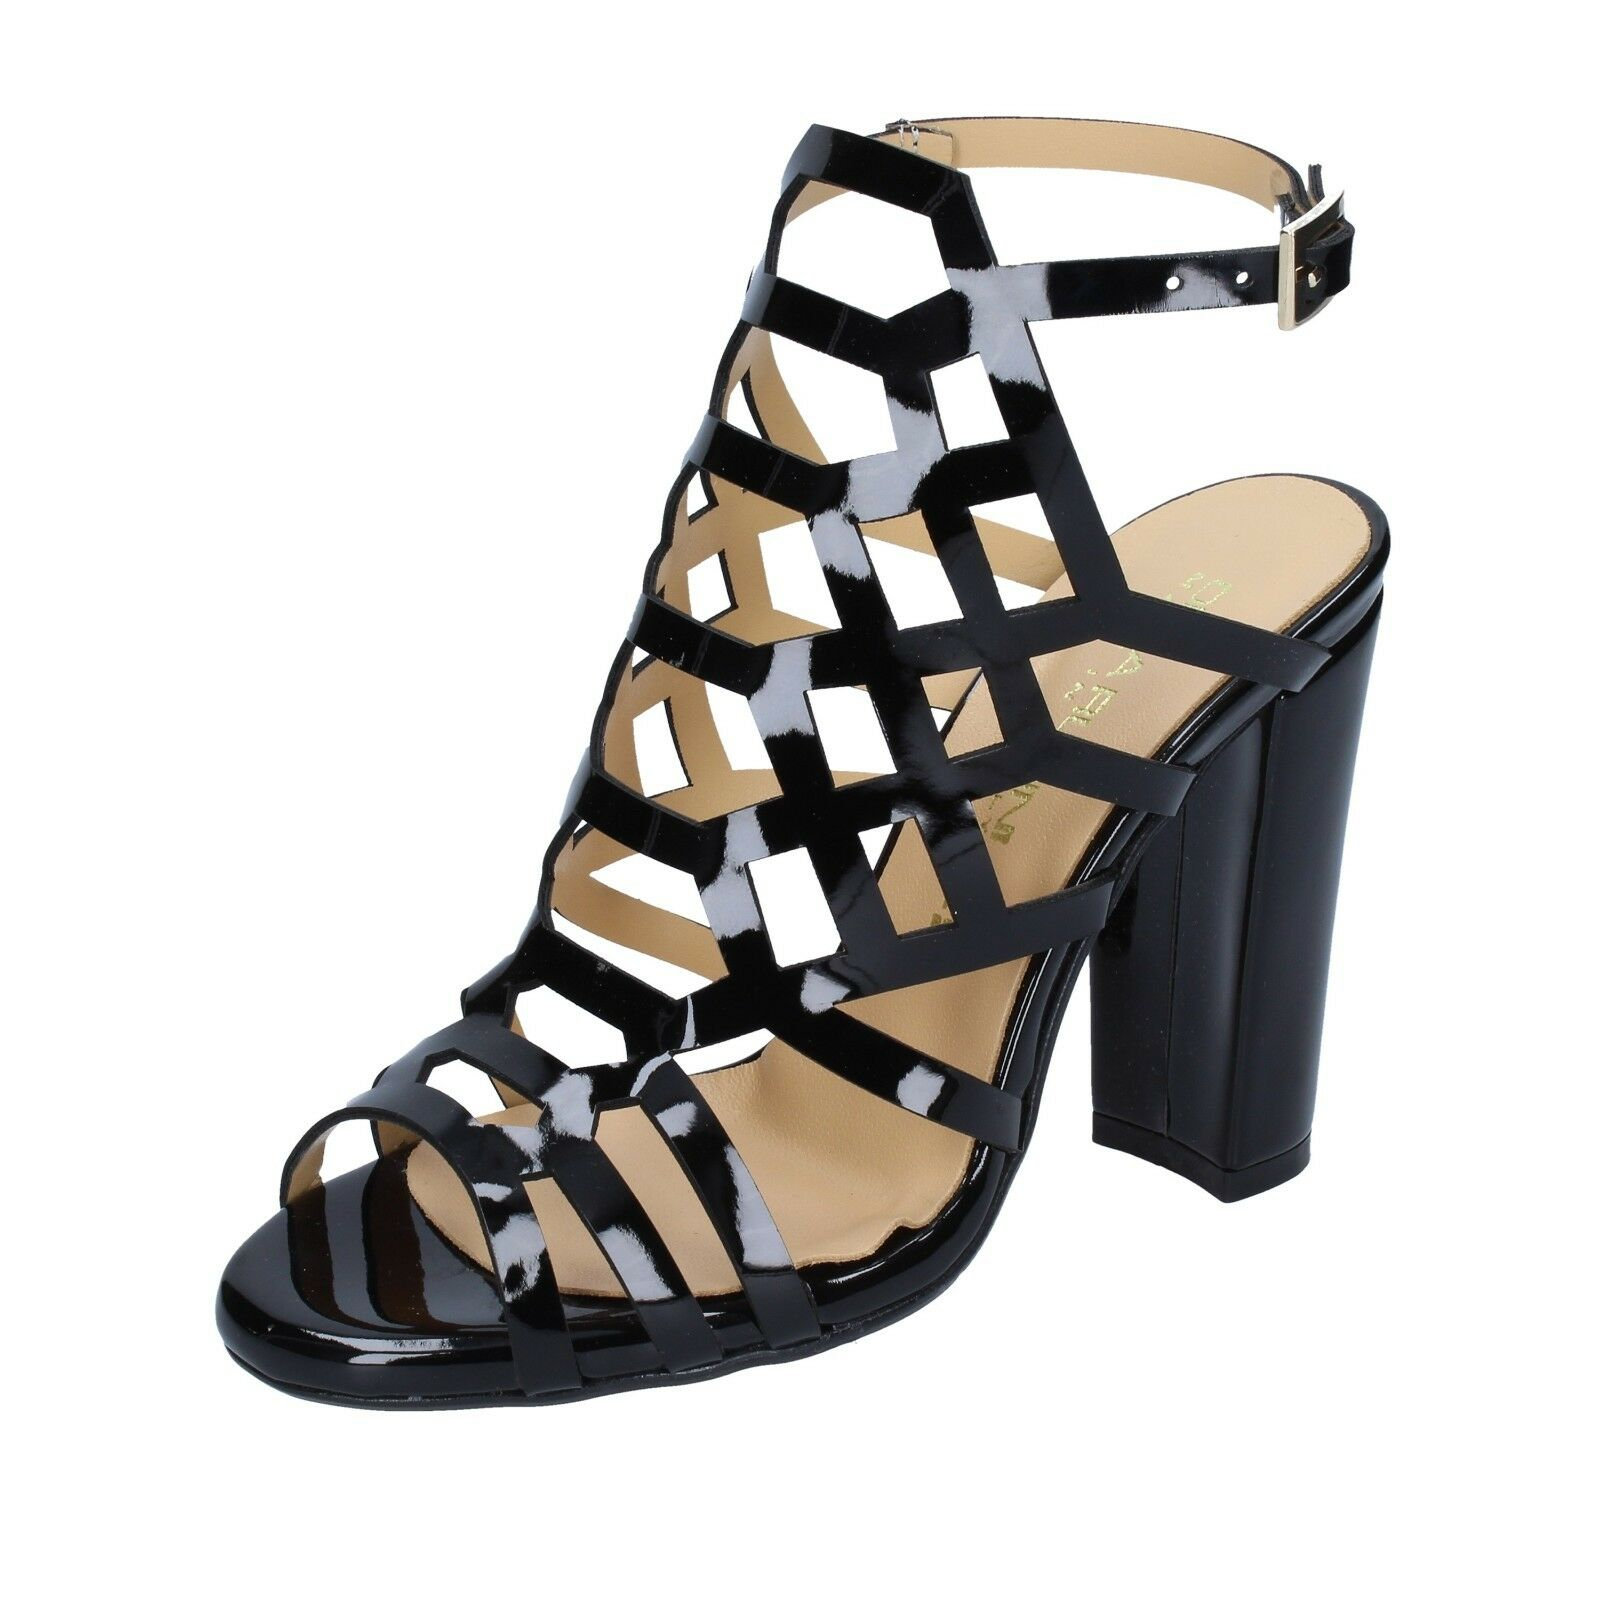 Para mujeres Zapatos Olga Olga Olga Rubini 3 (EU 36) Sandalias De Charol Negro BS162-36  mejor precio